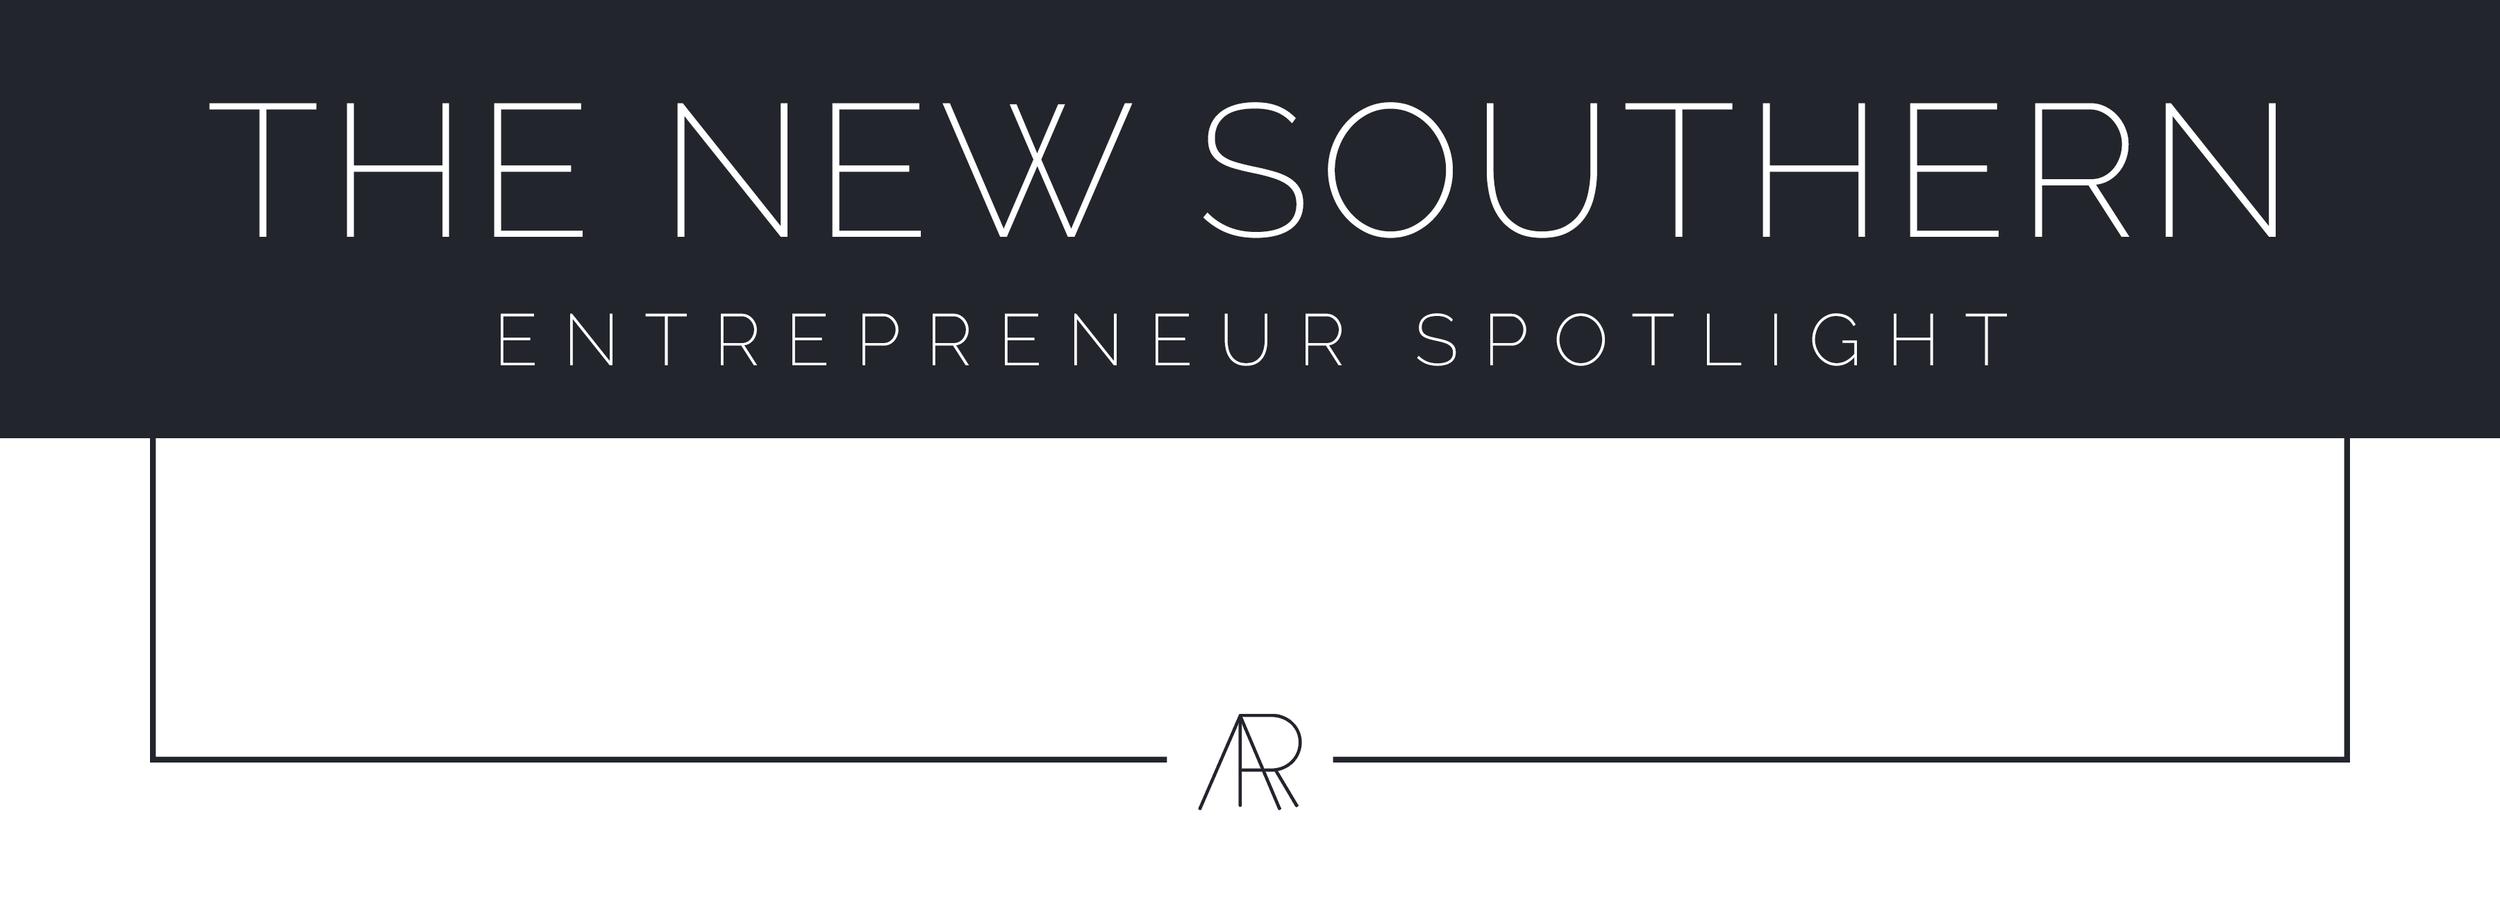 Alyssa Rosenheck's The New Southern Entrepreneur Spotlight with Lee Kleinhelter, Pieces of Atlanta, GA